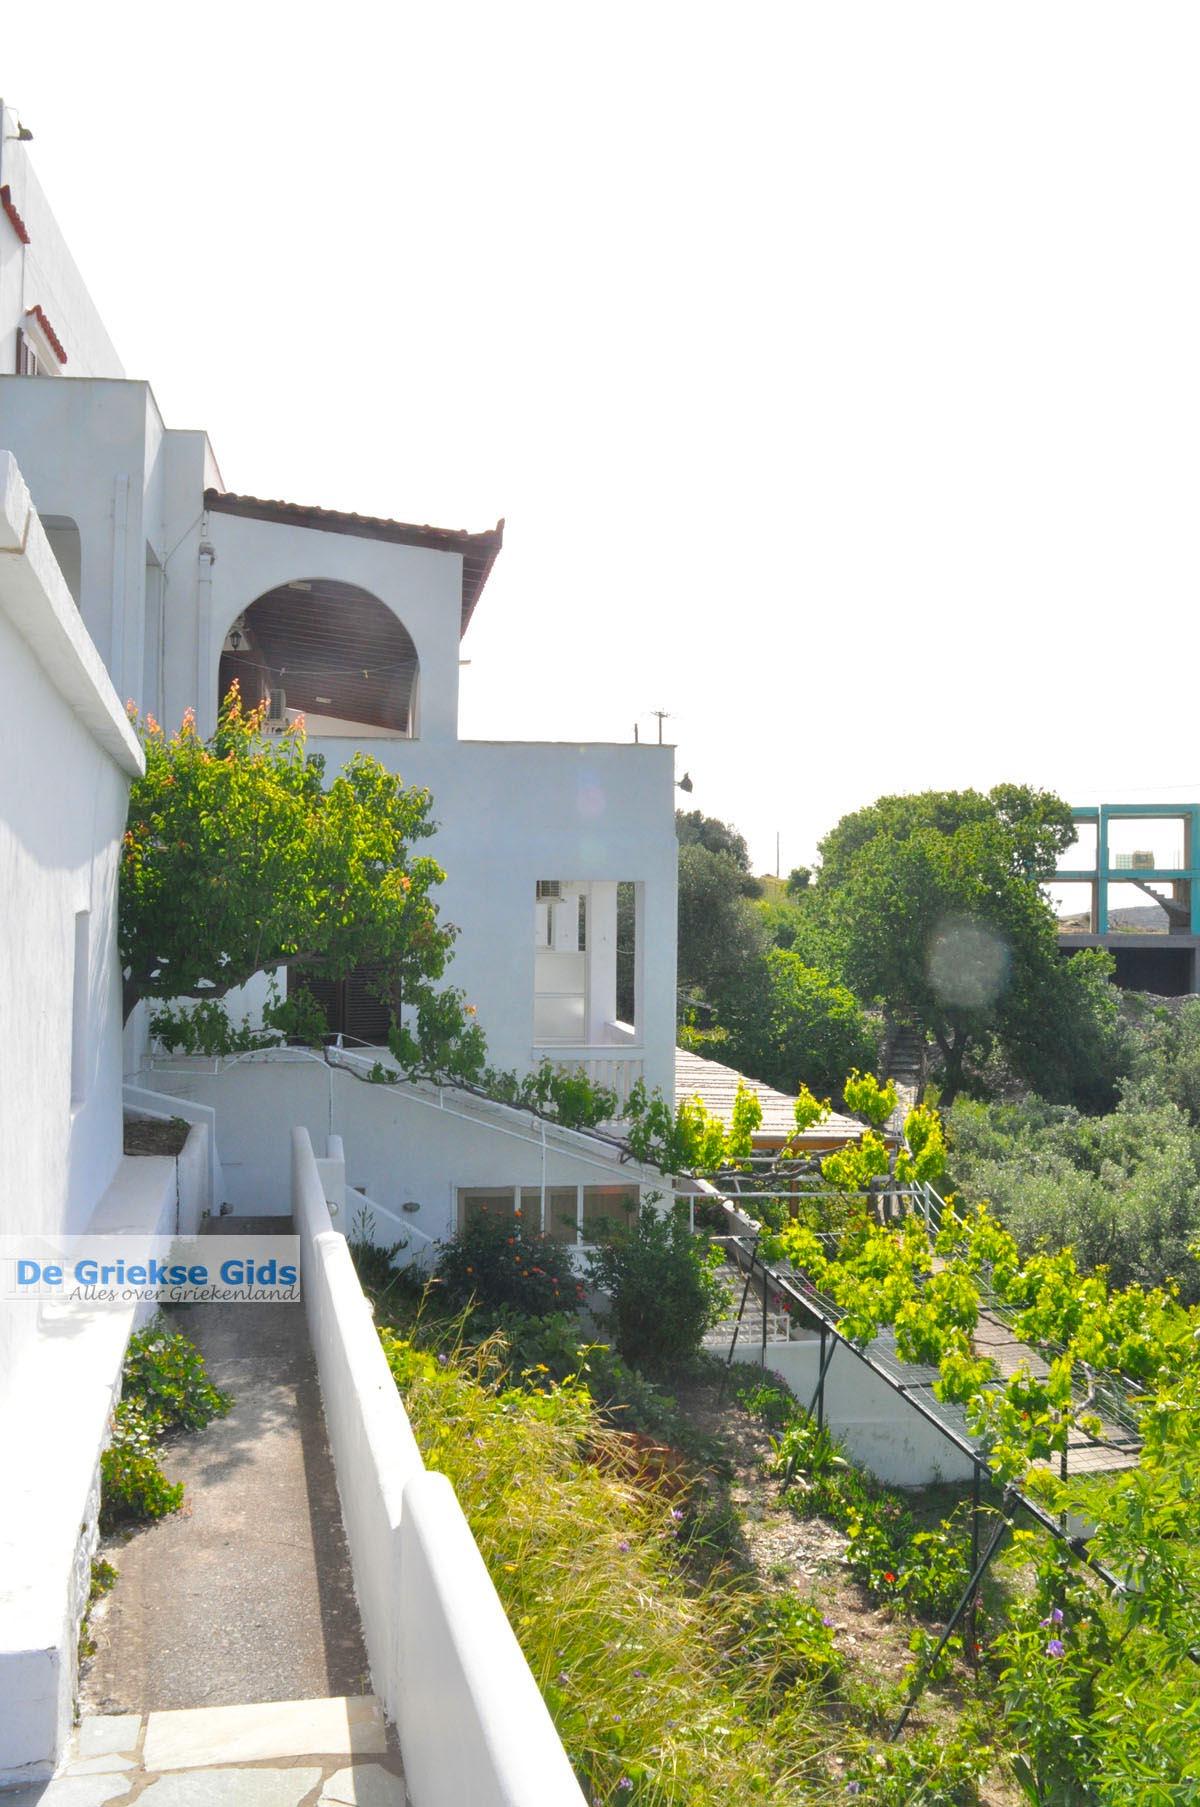 foto Appartementen Myrtho op eiland Andros | De Griekse Gids foto 18